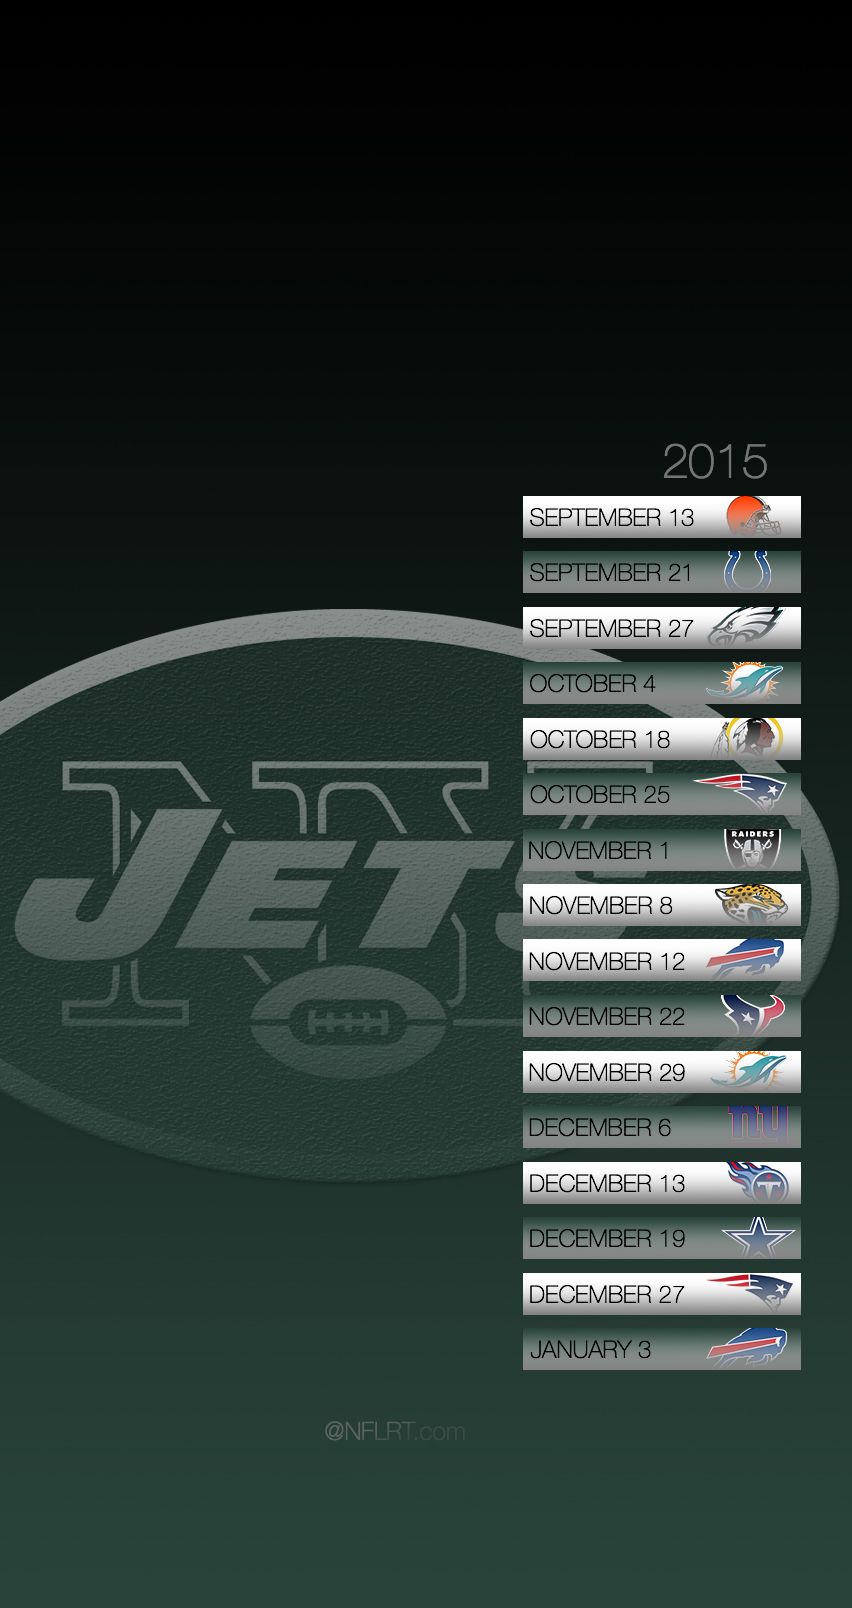 47 New York Jets Wallpaper 2016 On Wallpapersafari